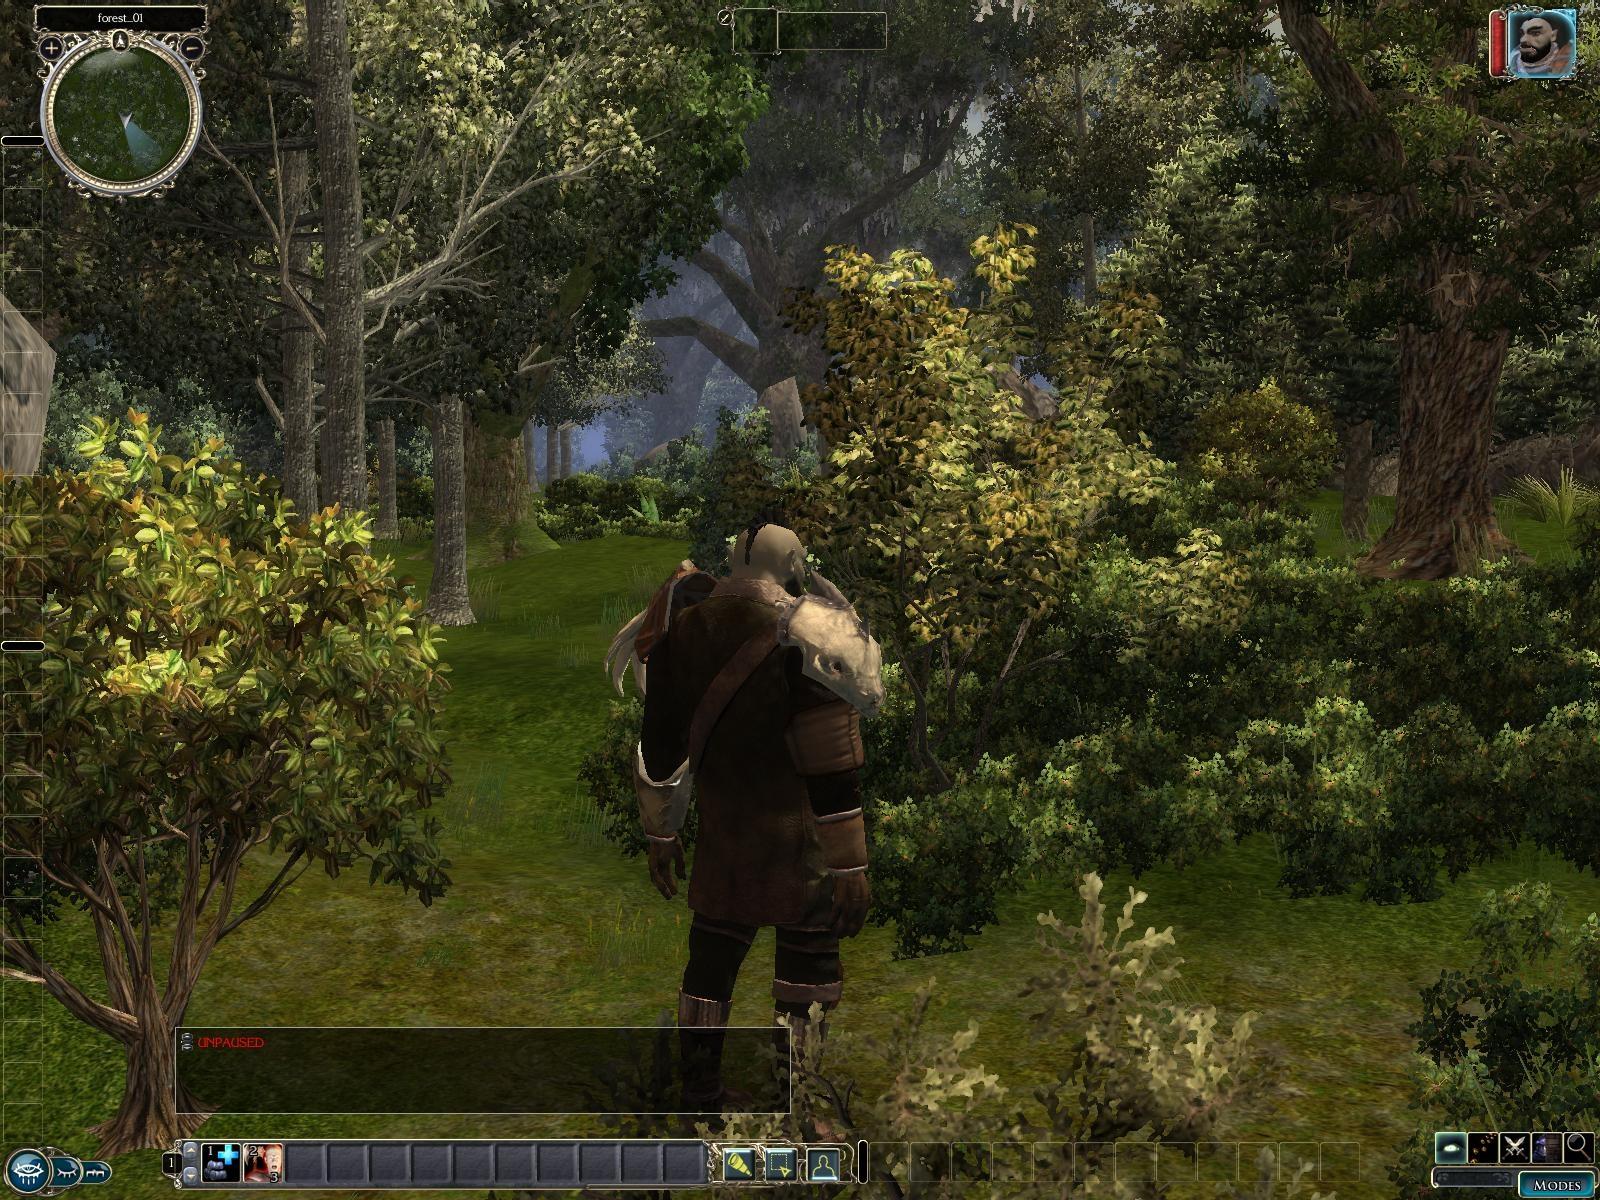 How long is Neverwinter Nights 2? - HLTB - HowLongToBeat